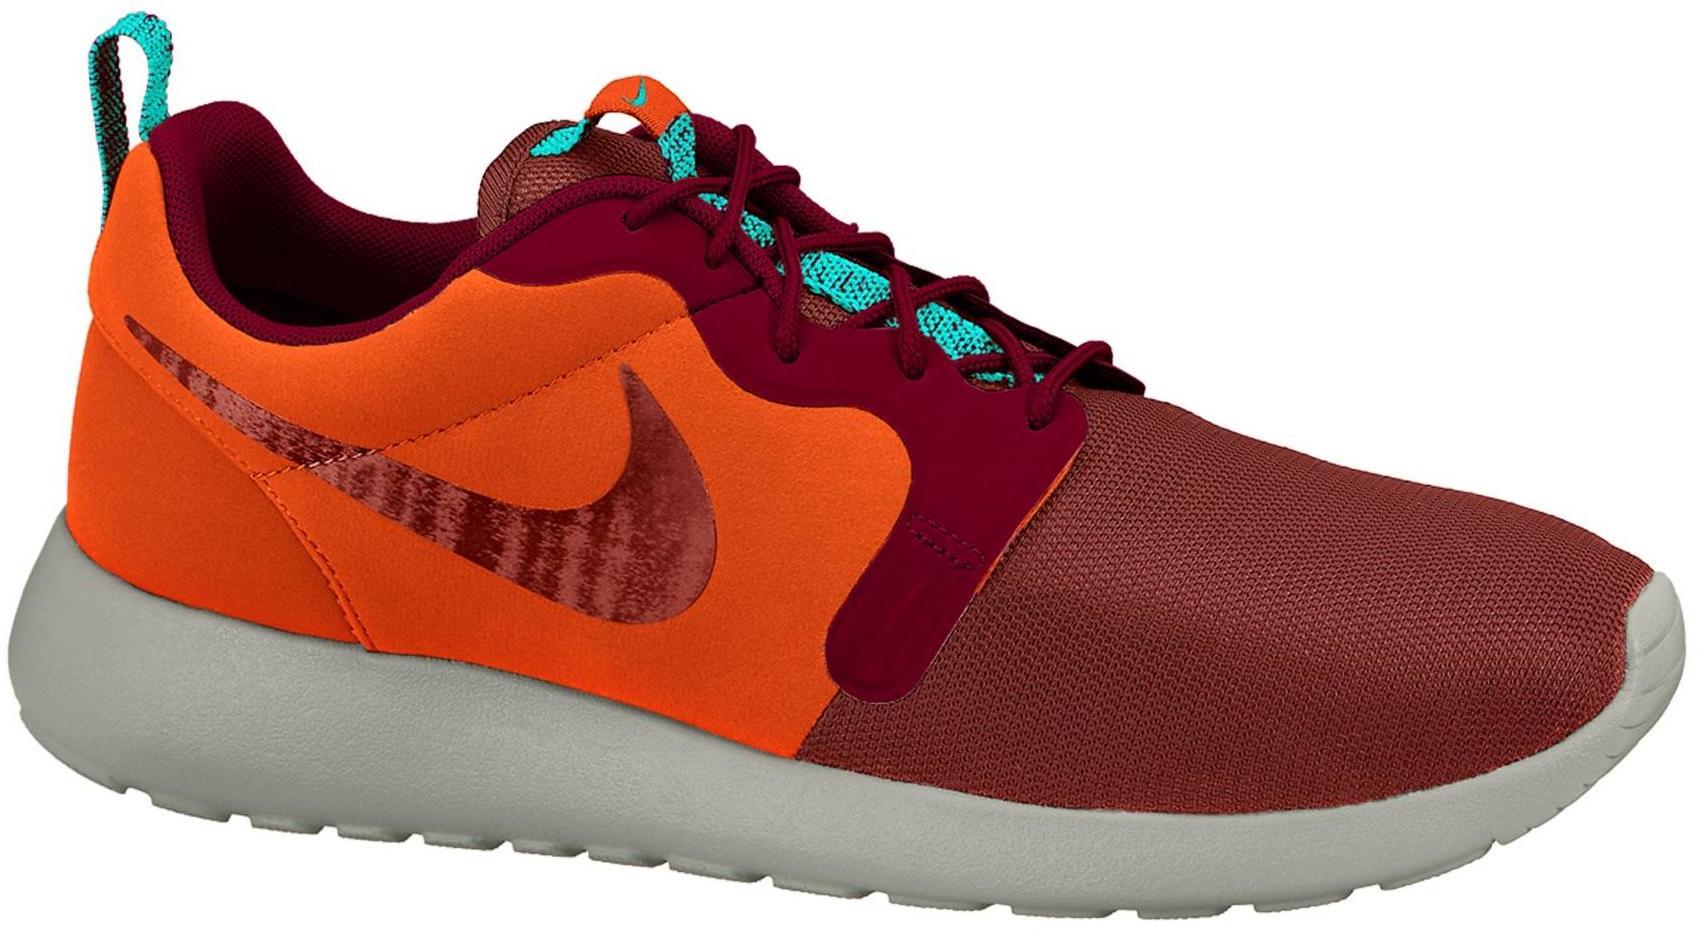 Nike Roshe Run Hyperfuse Team Orange